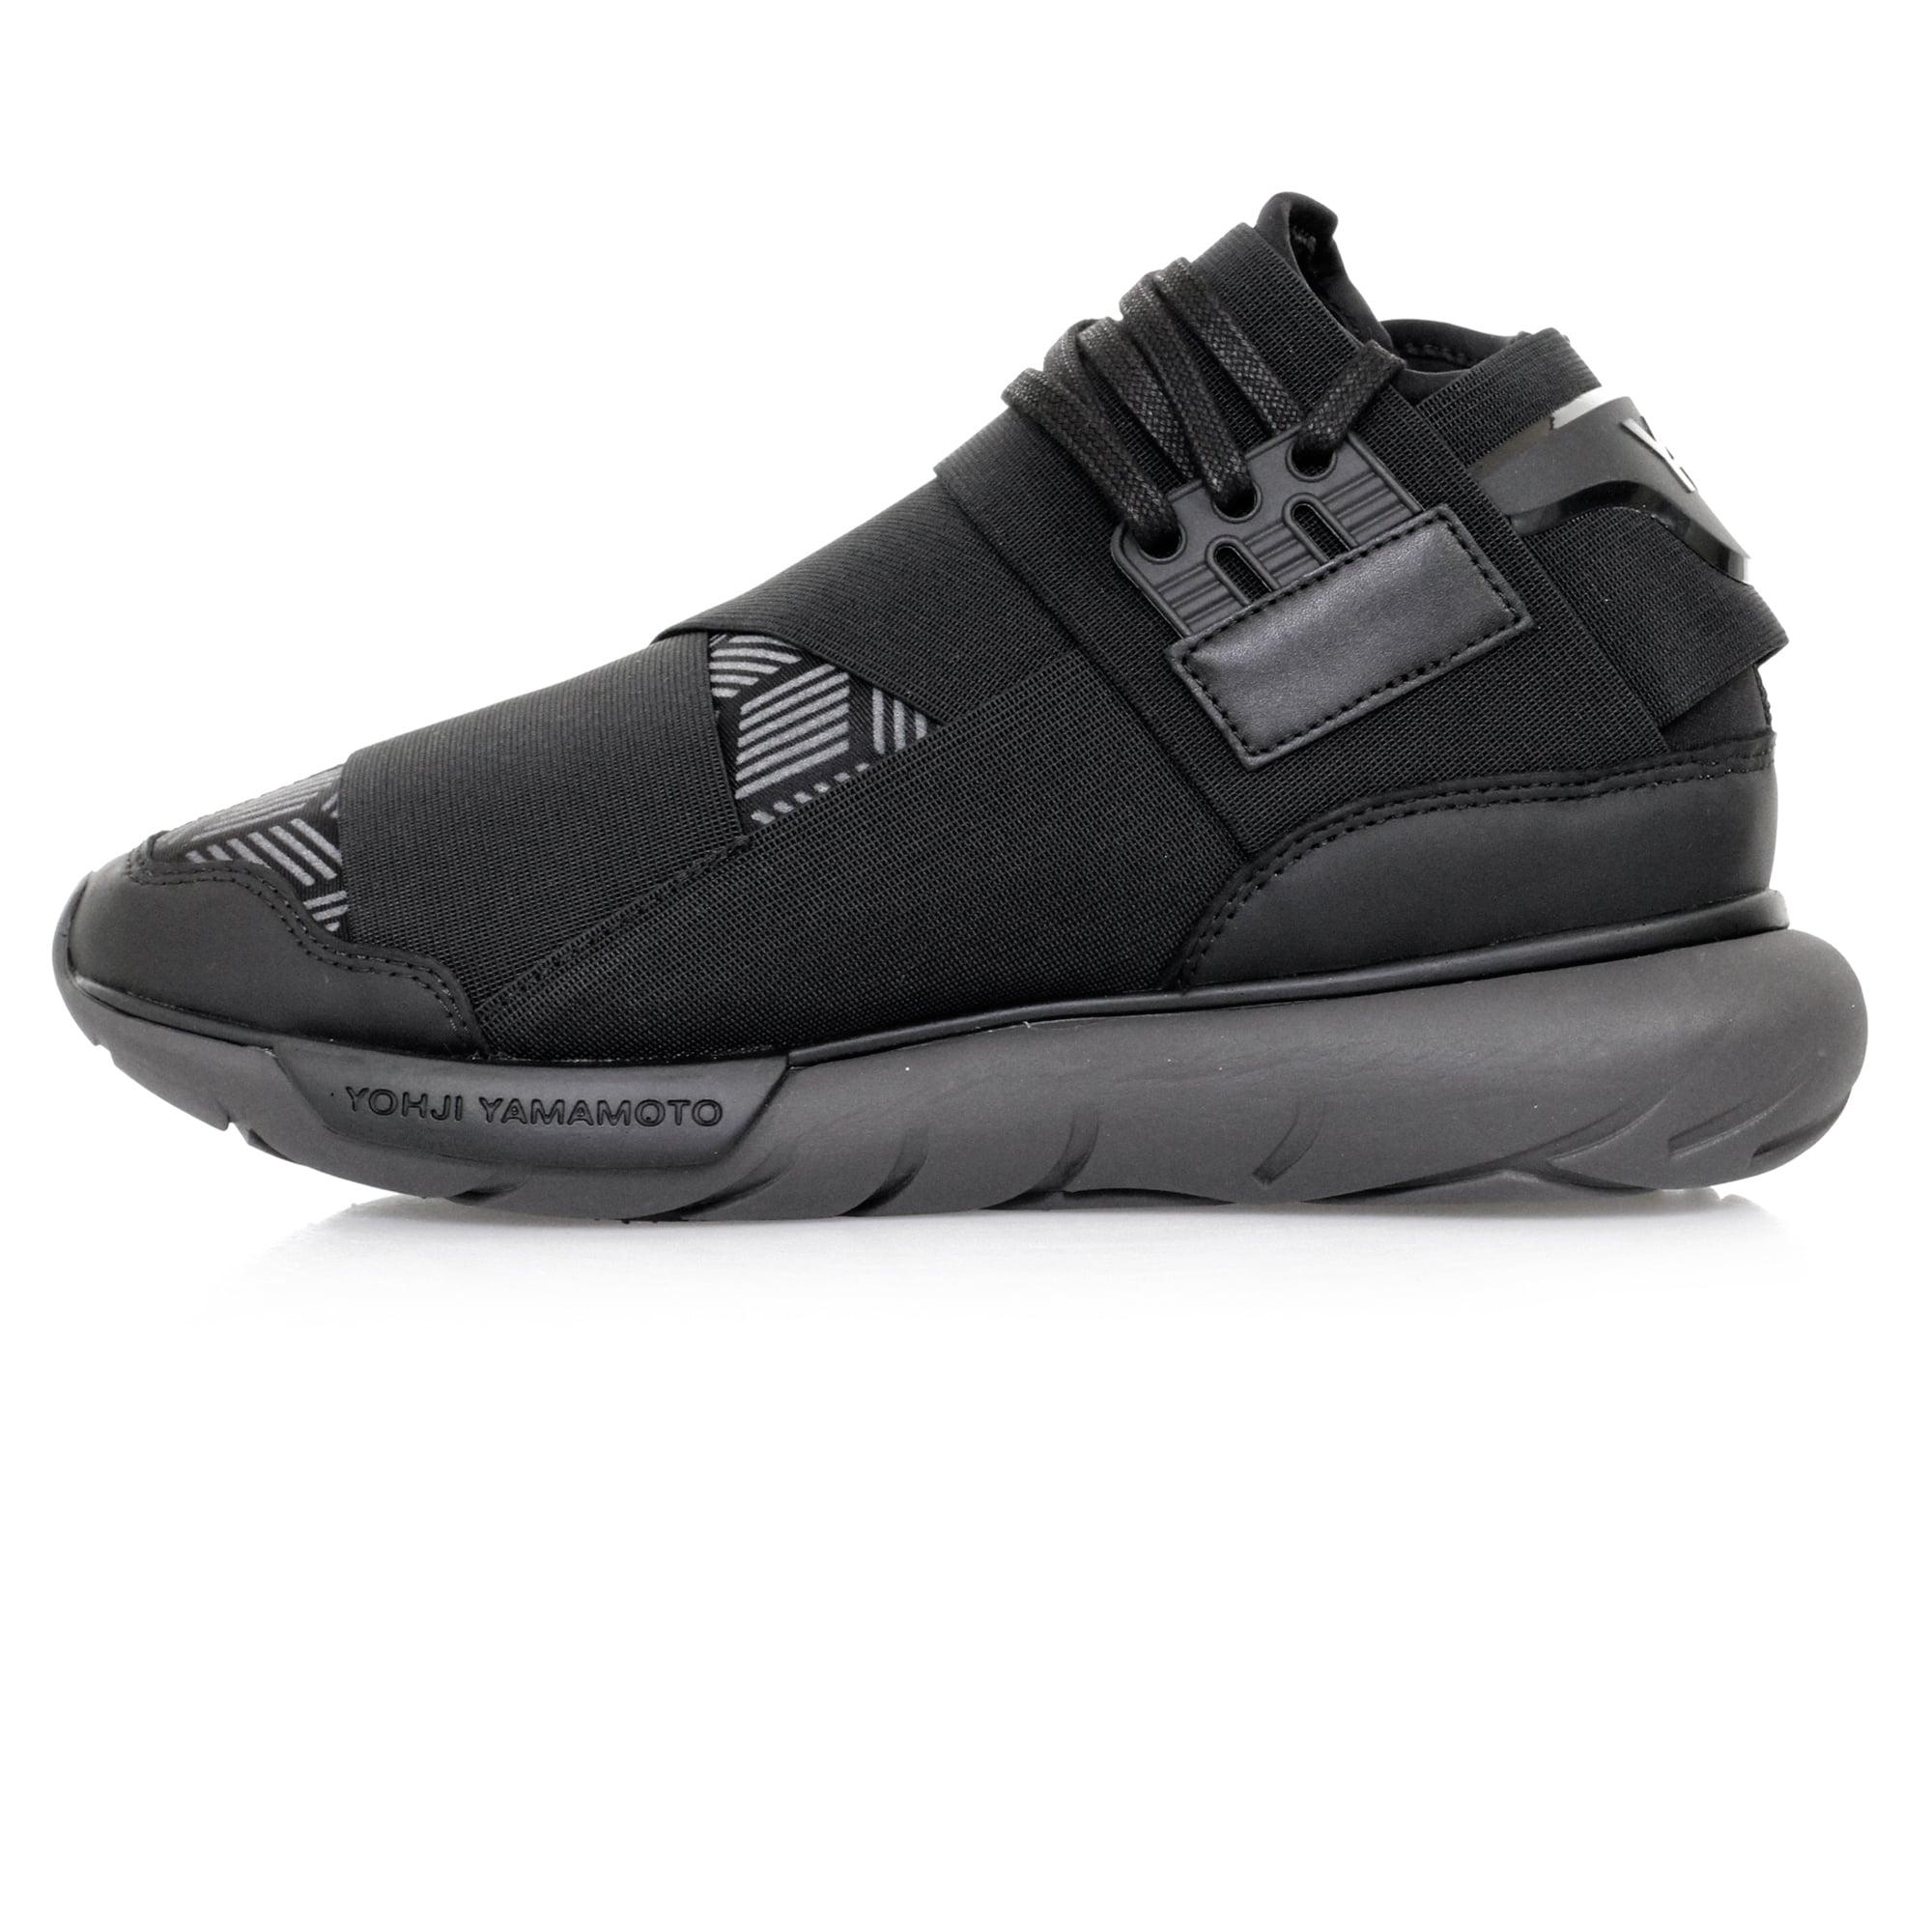 a718a311d46dc ... adidas y 3 qasa high utility black shoe s82123